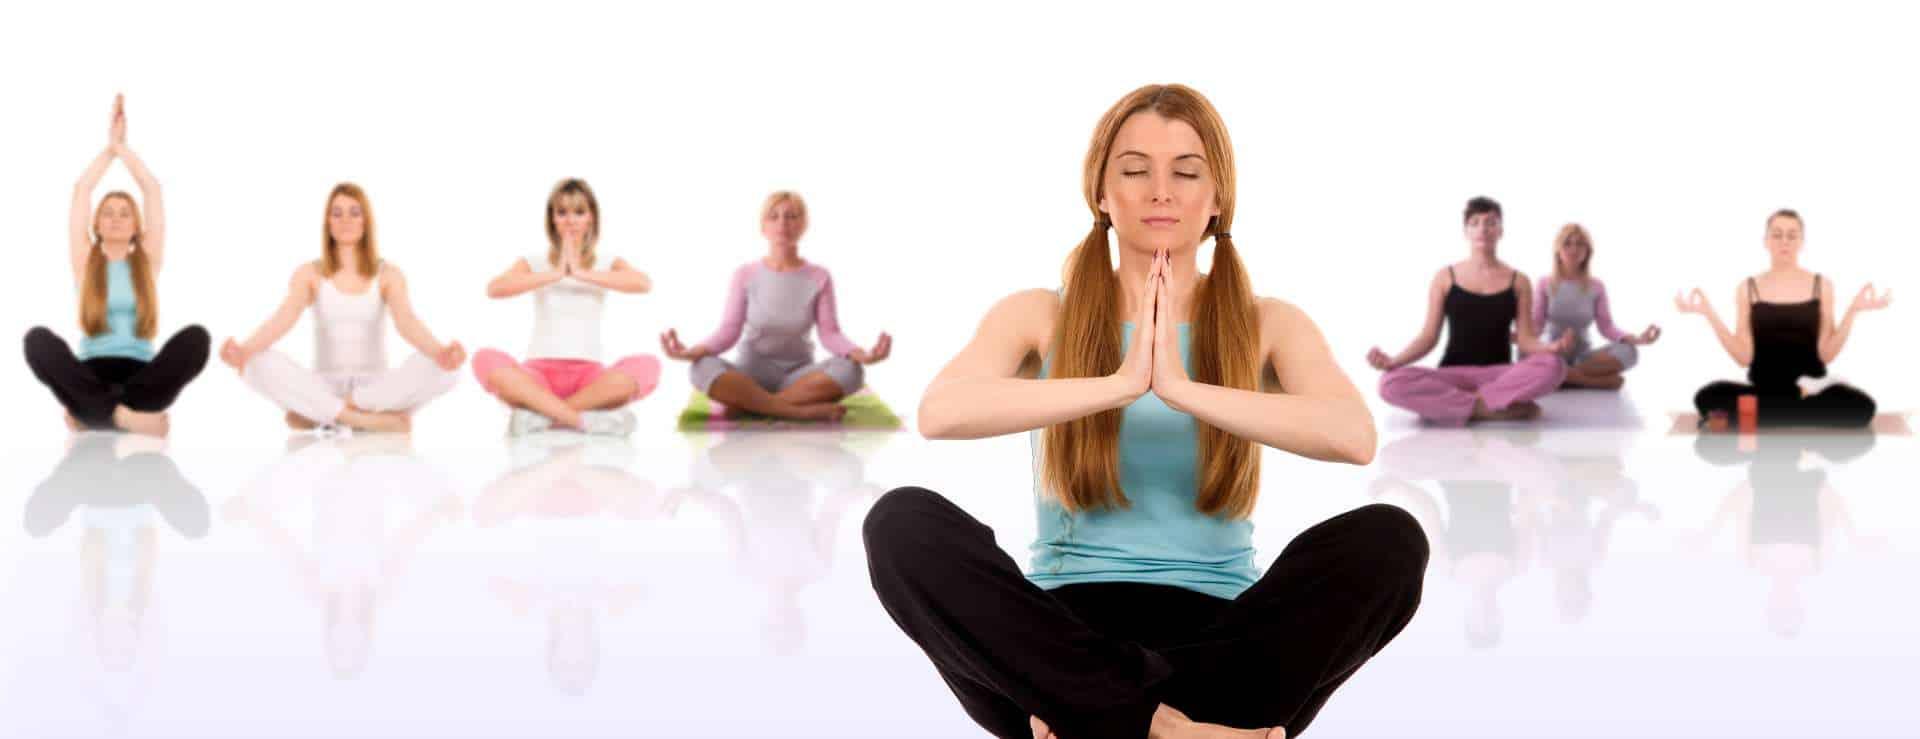 Yoga in Wuppertal – Kursstart nach Ostern